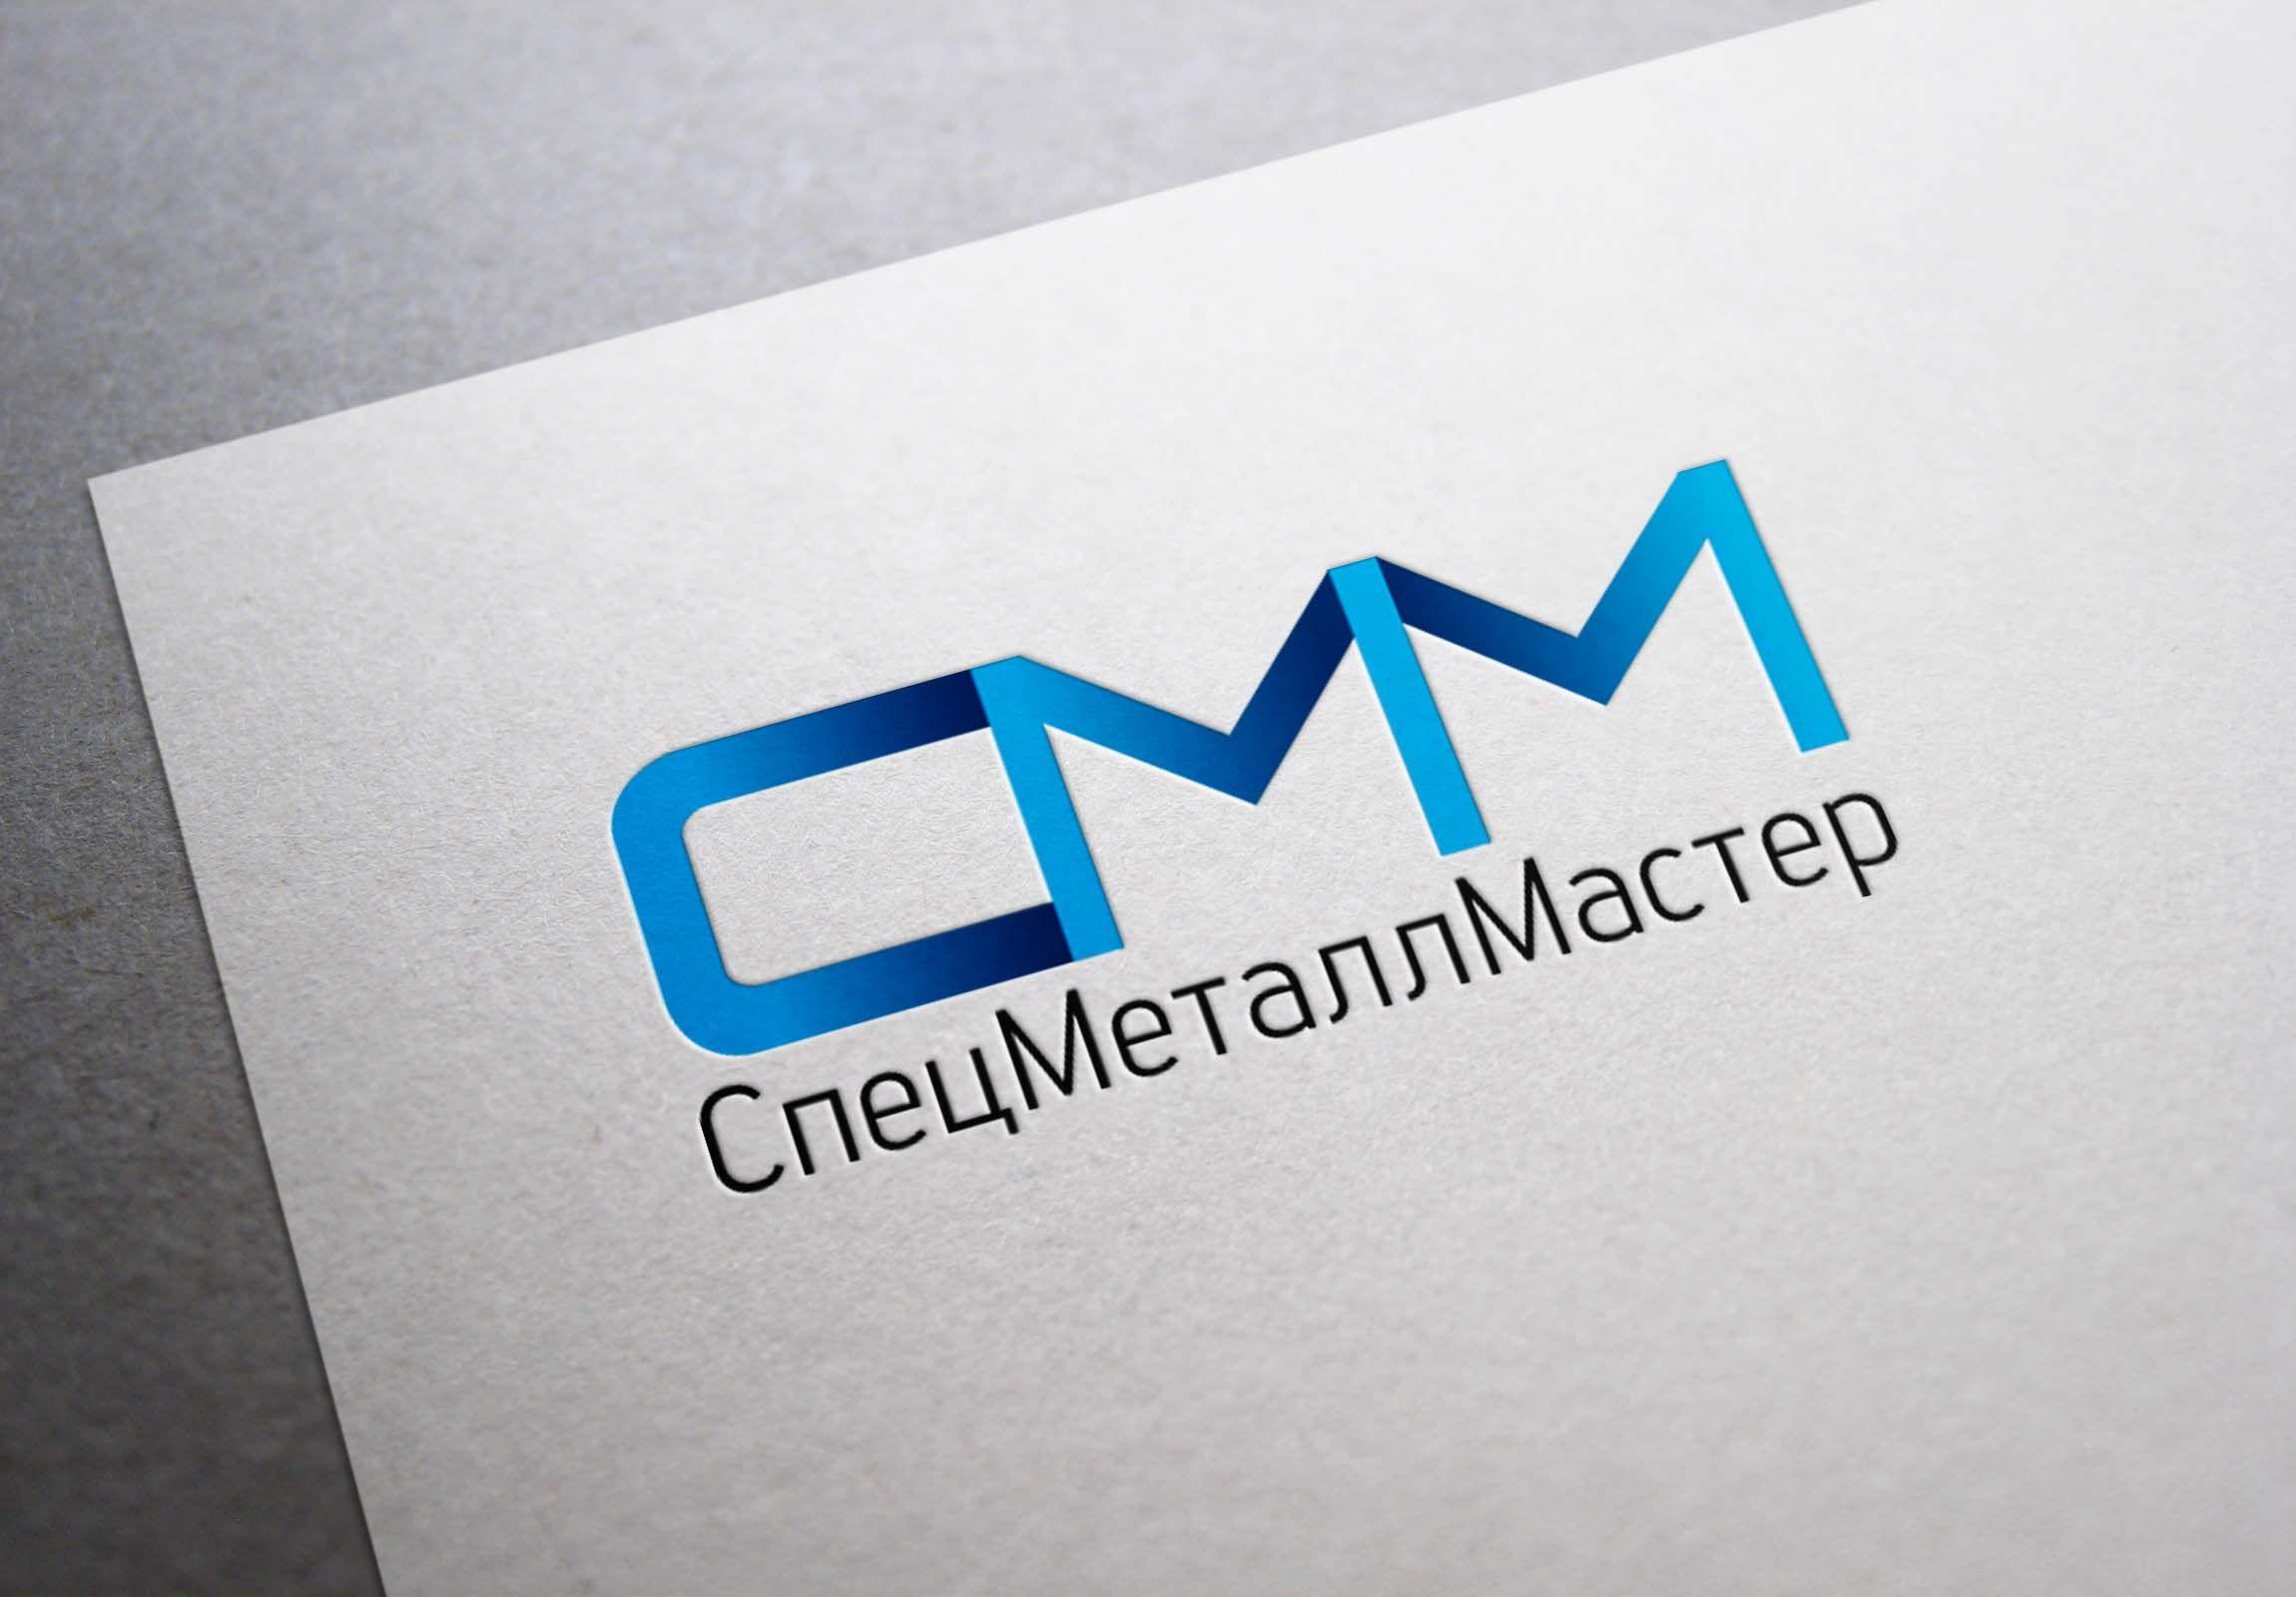 Логотип для металлургической компании - дизайнер rammulka